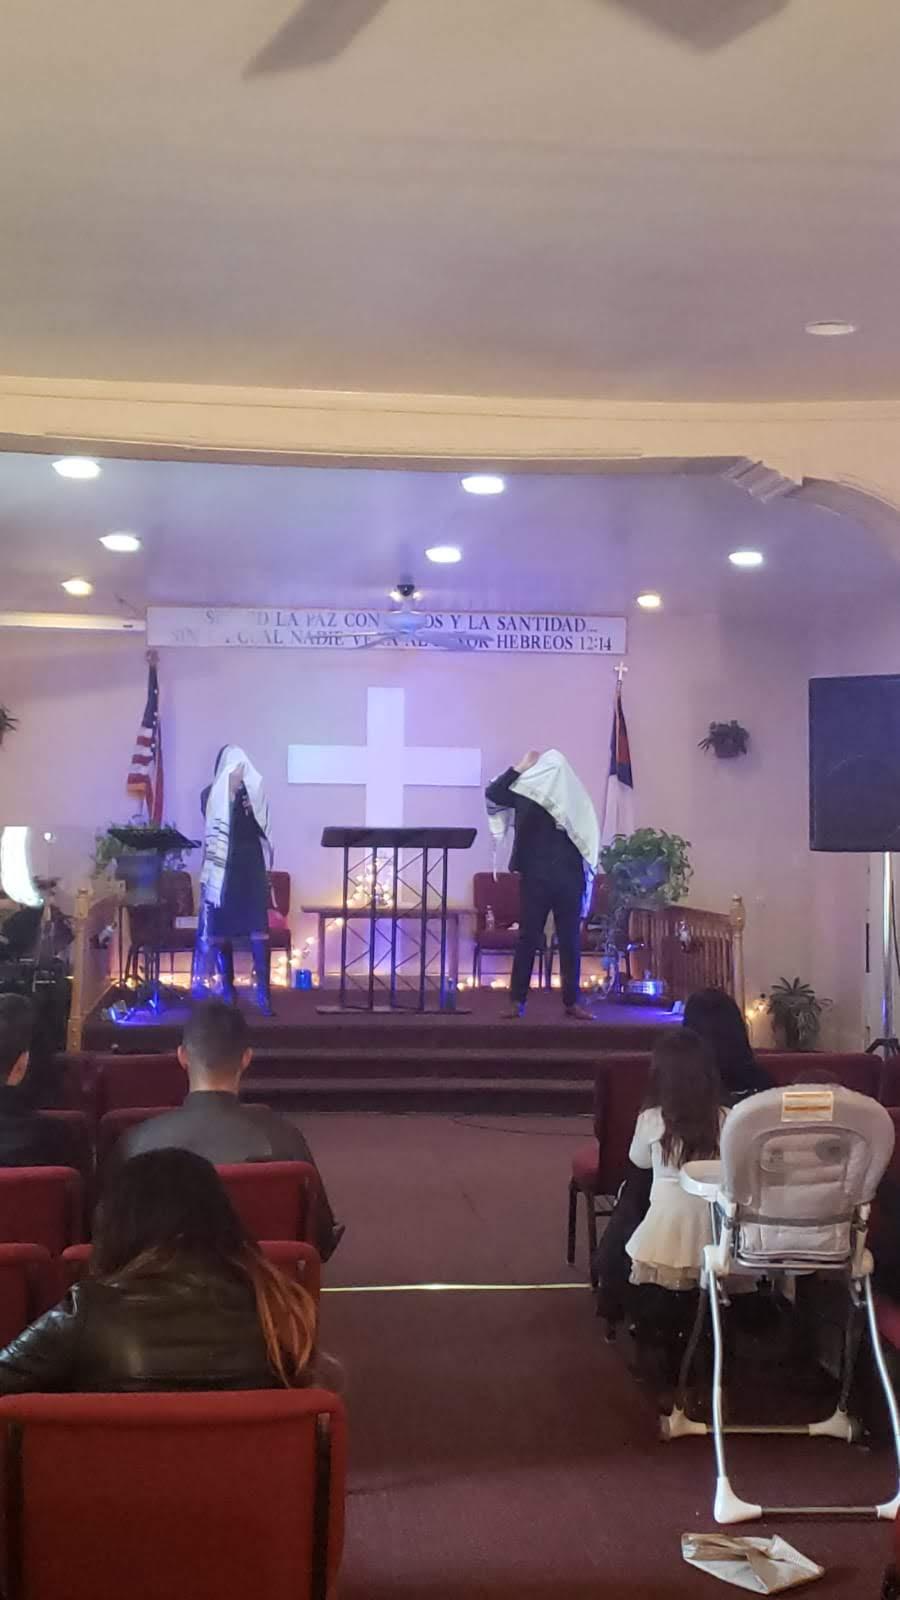 First Christian Church of The Good Shepherd/Primera Iglesia Cris - church  | Photo 9 of 10 | Address: 79 Main St, Haverstraw, NY 10927, USA | Phone: (845) 942-8631